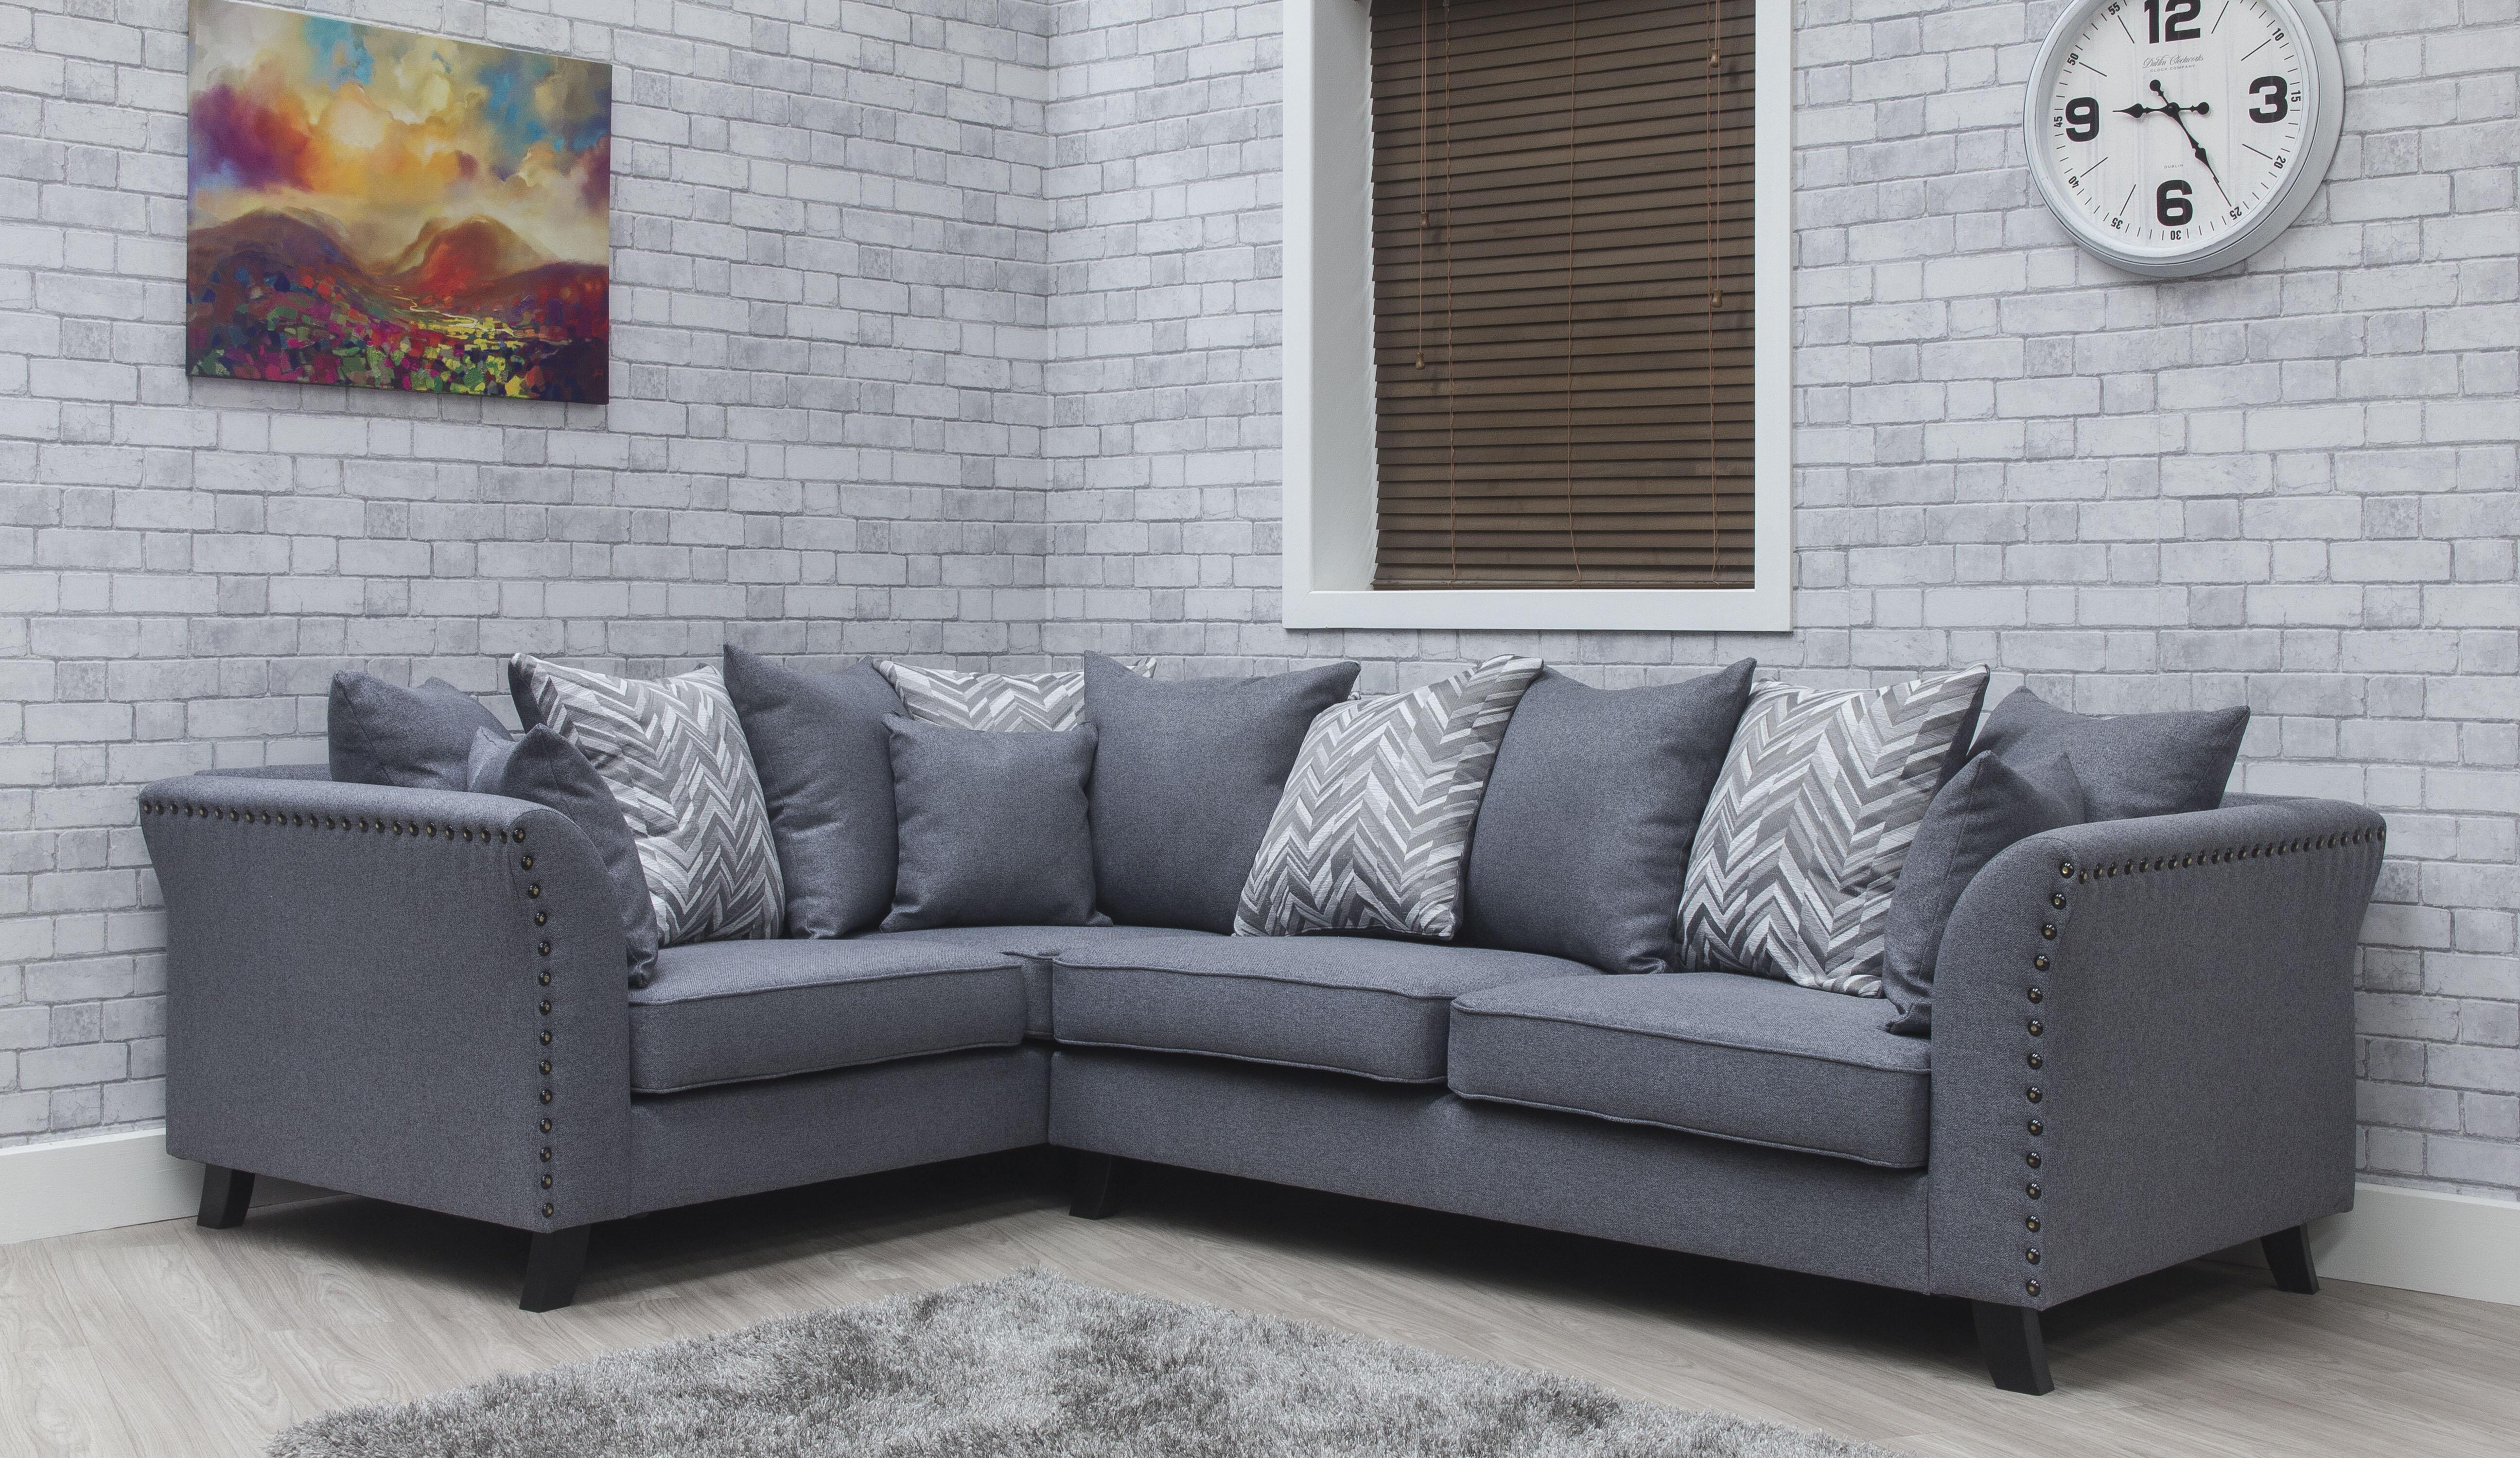 Cassia Fabric Sofa - Steel 4